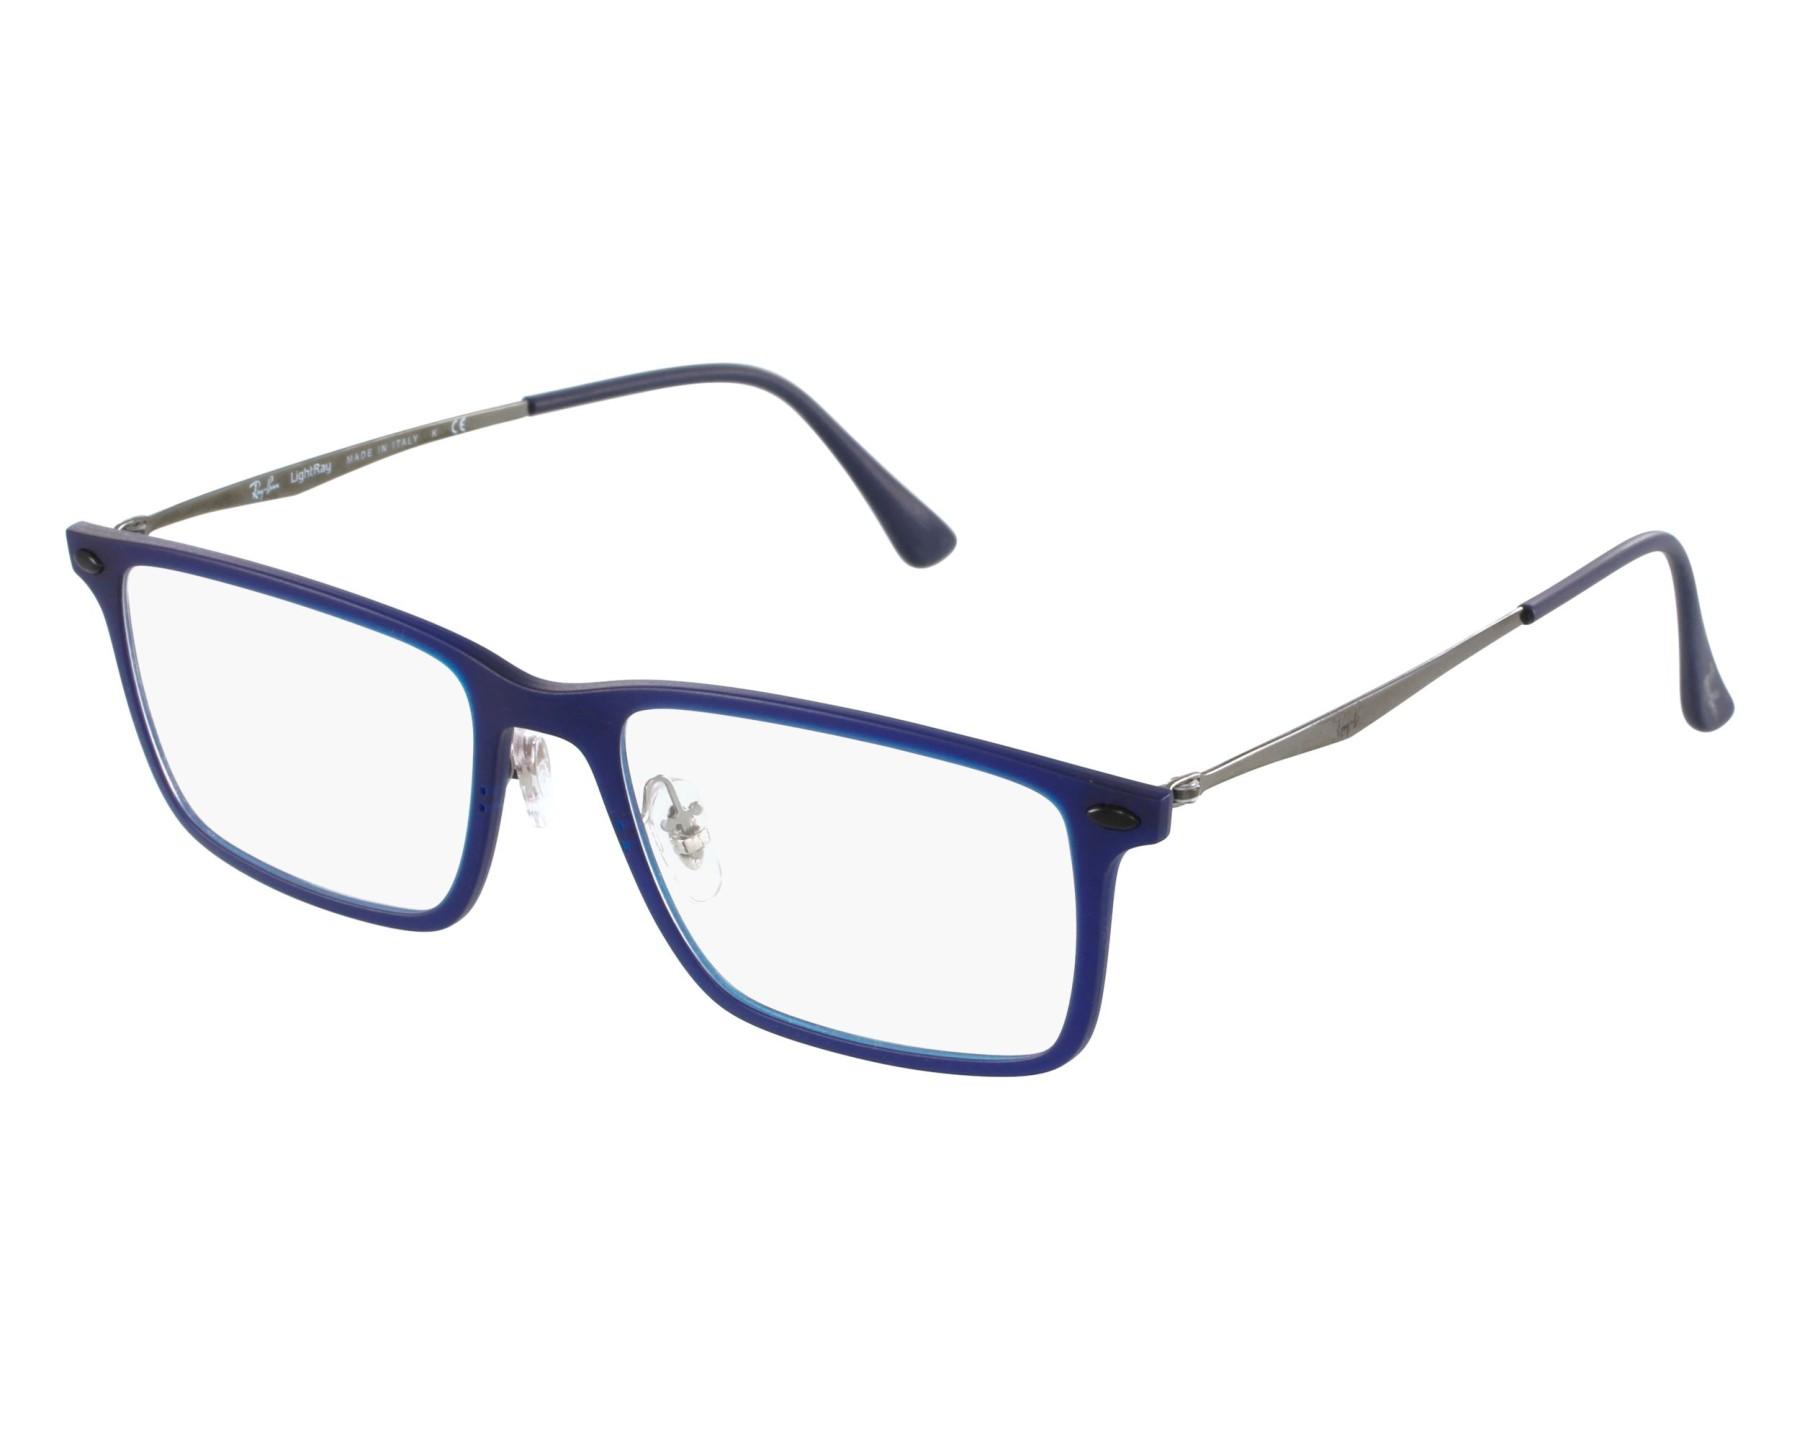 0cc1bb001d ... new style eyeglasses ray ban rx 7050 5451 54 18 blue gun front view  97eb0 f9aff